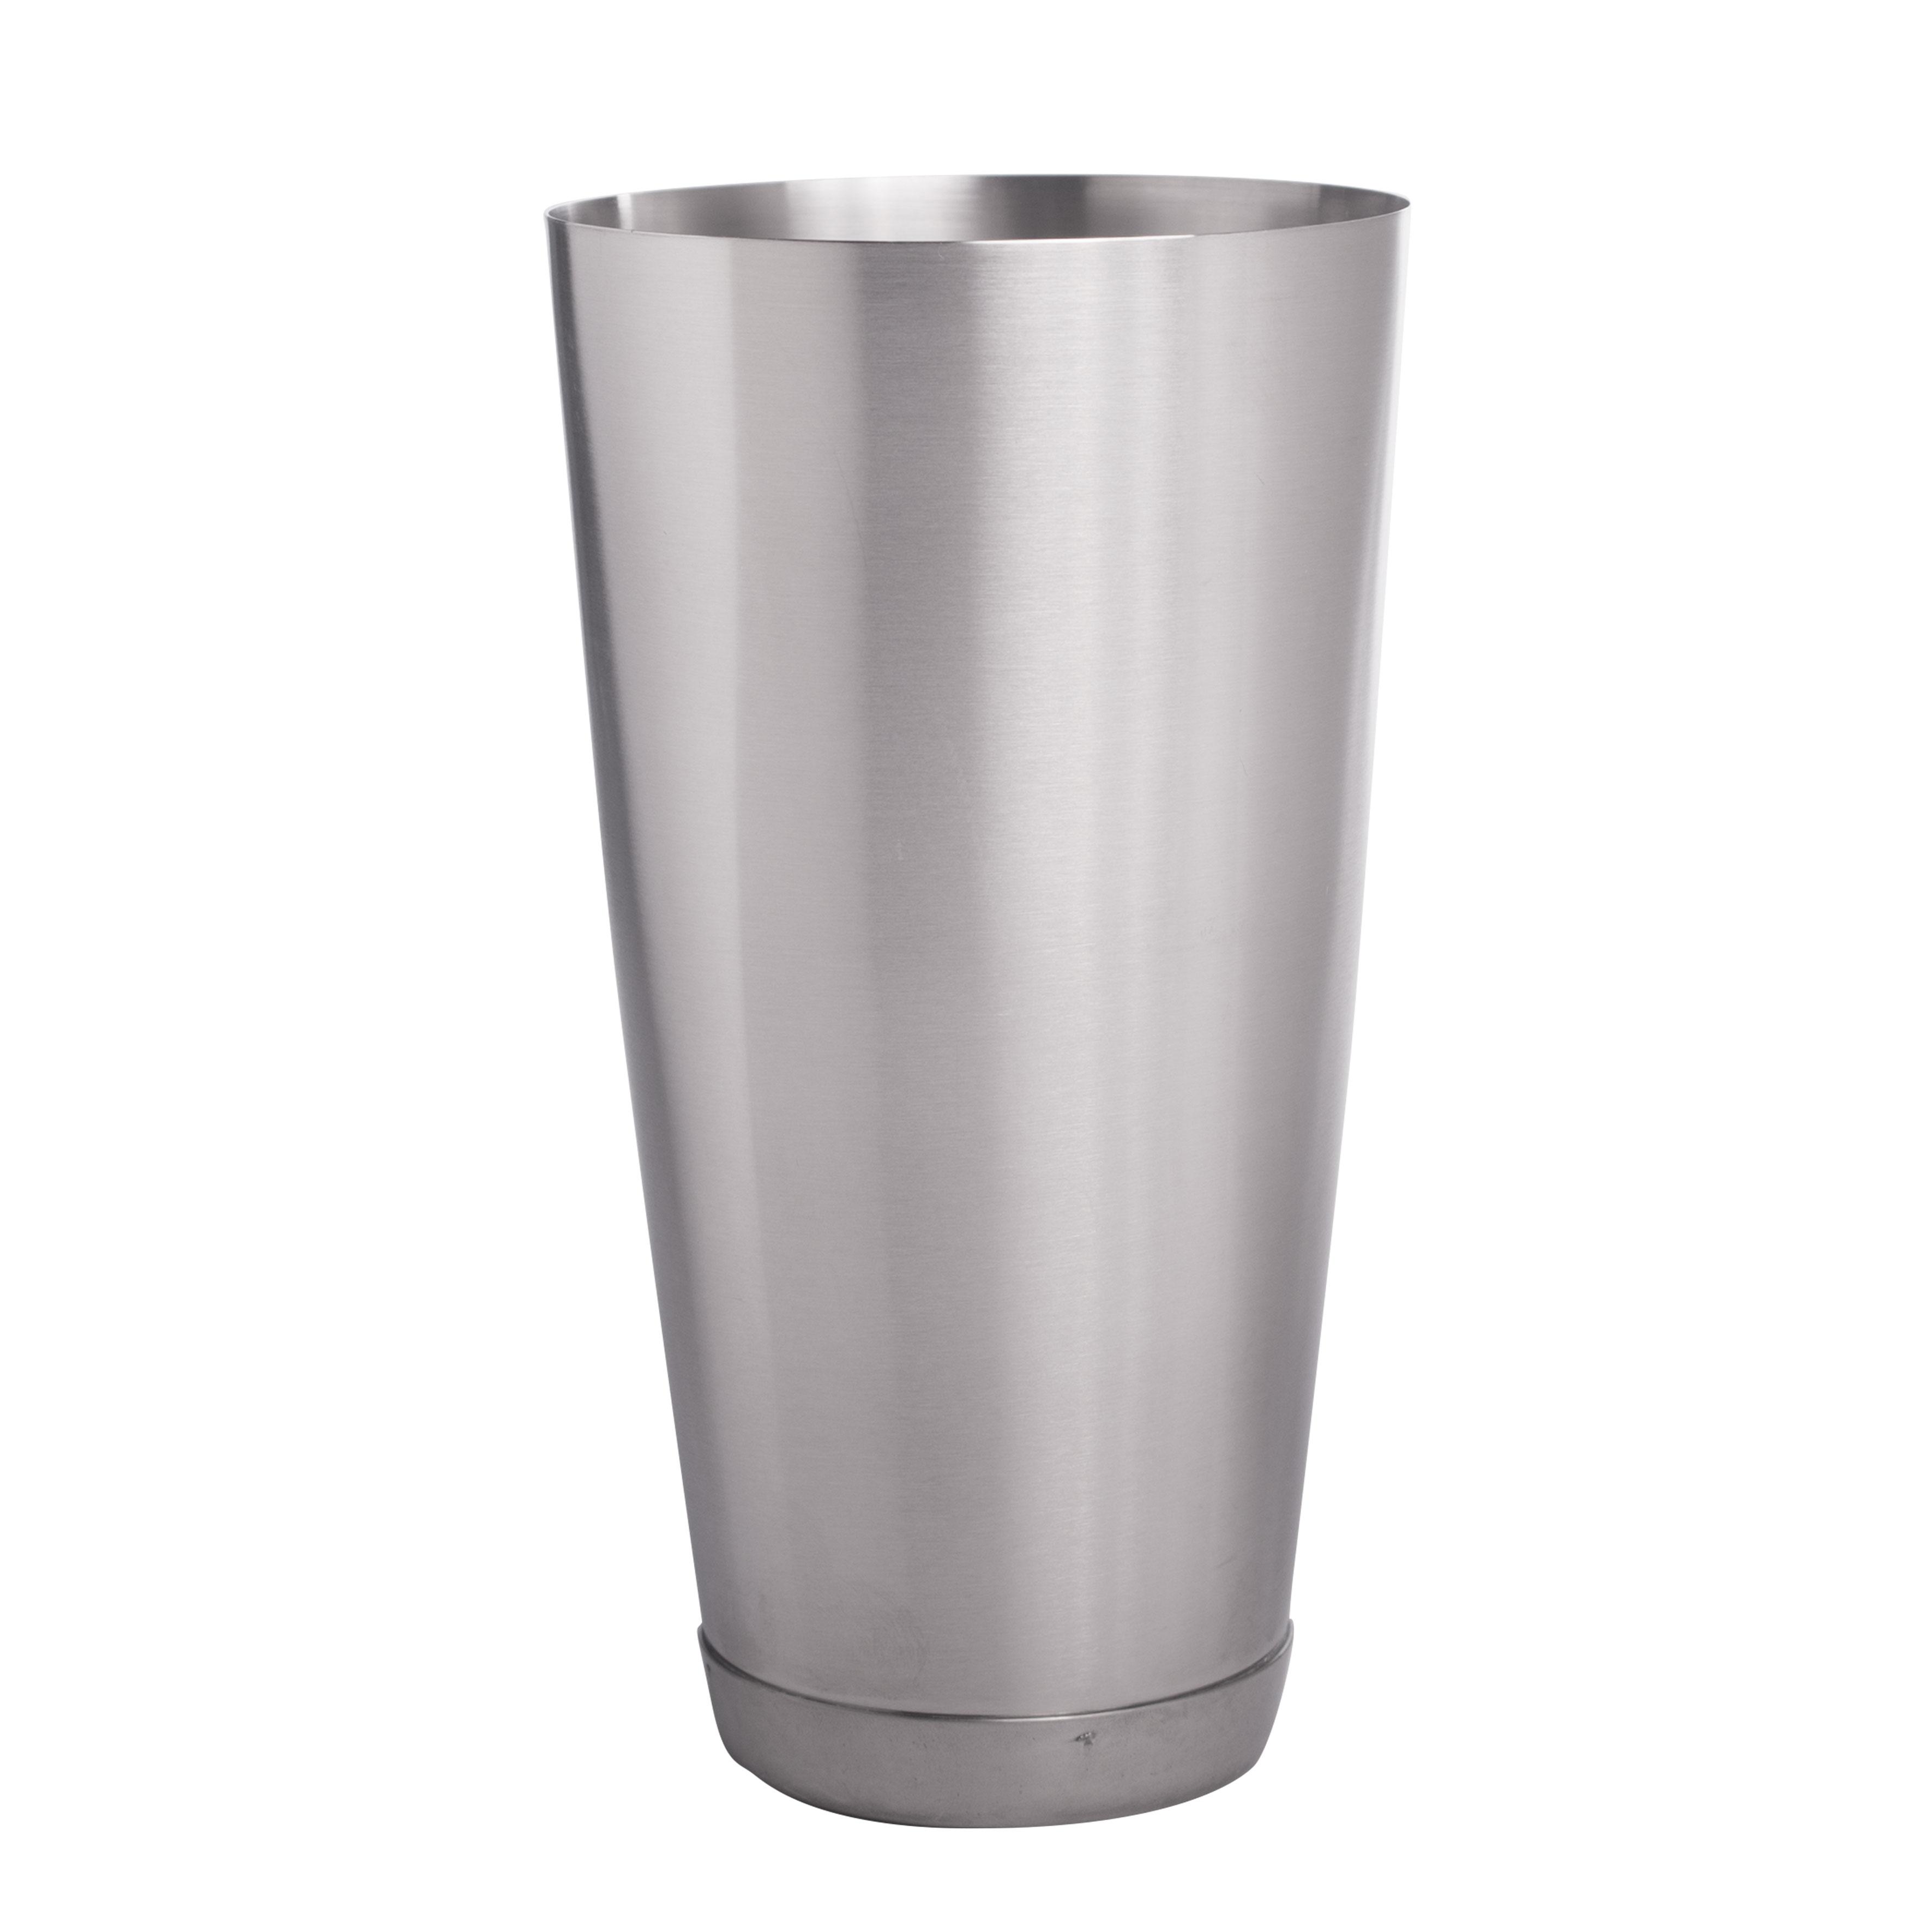 Boston-Shaker, gebürstet, ohne Glas 5139